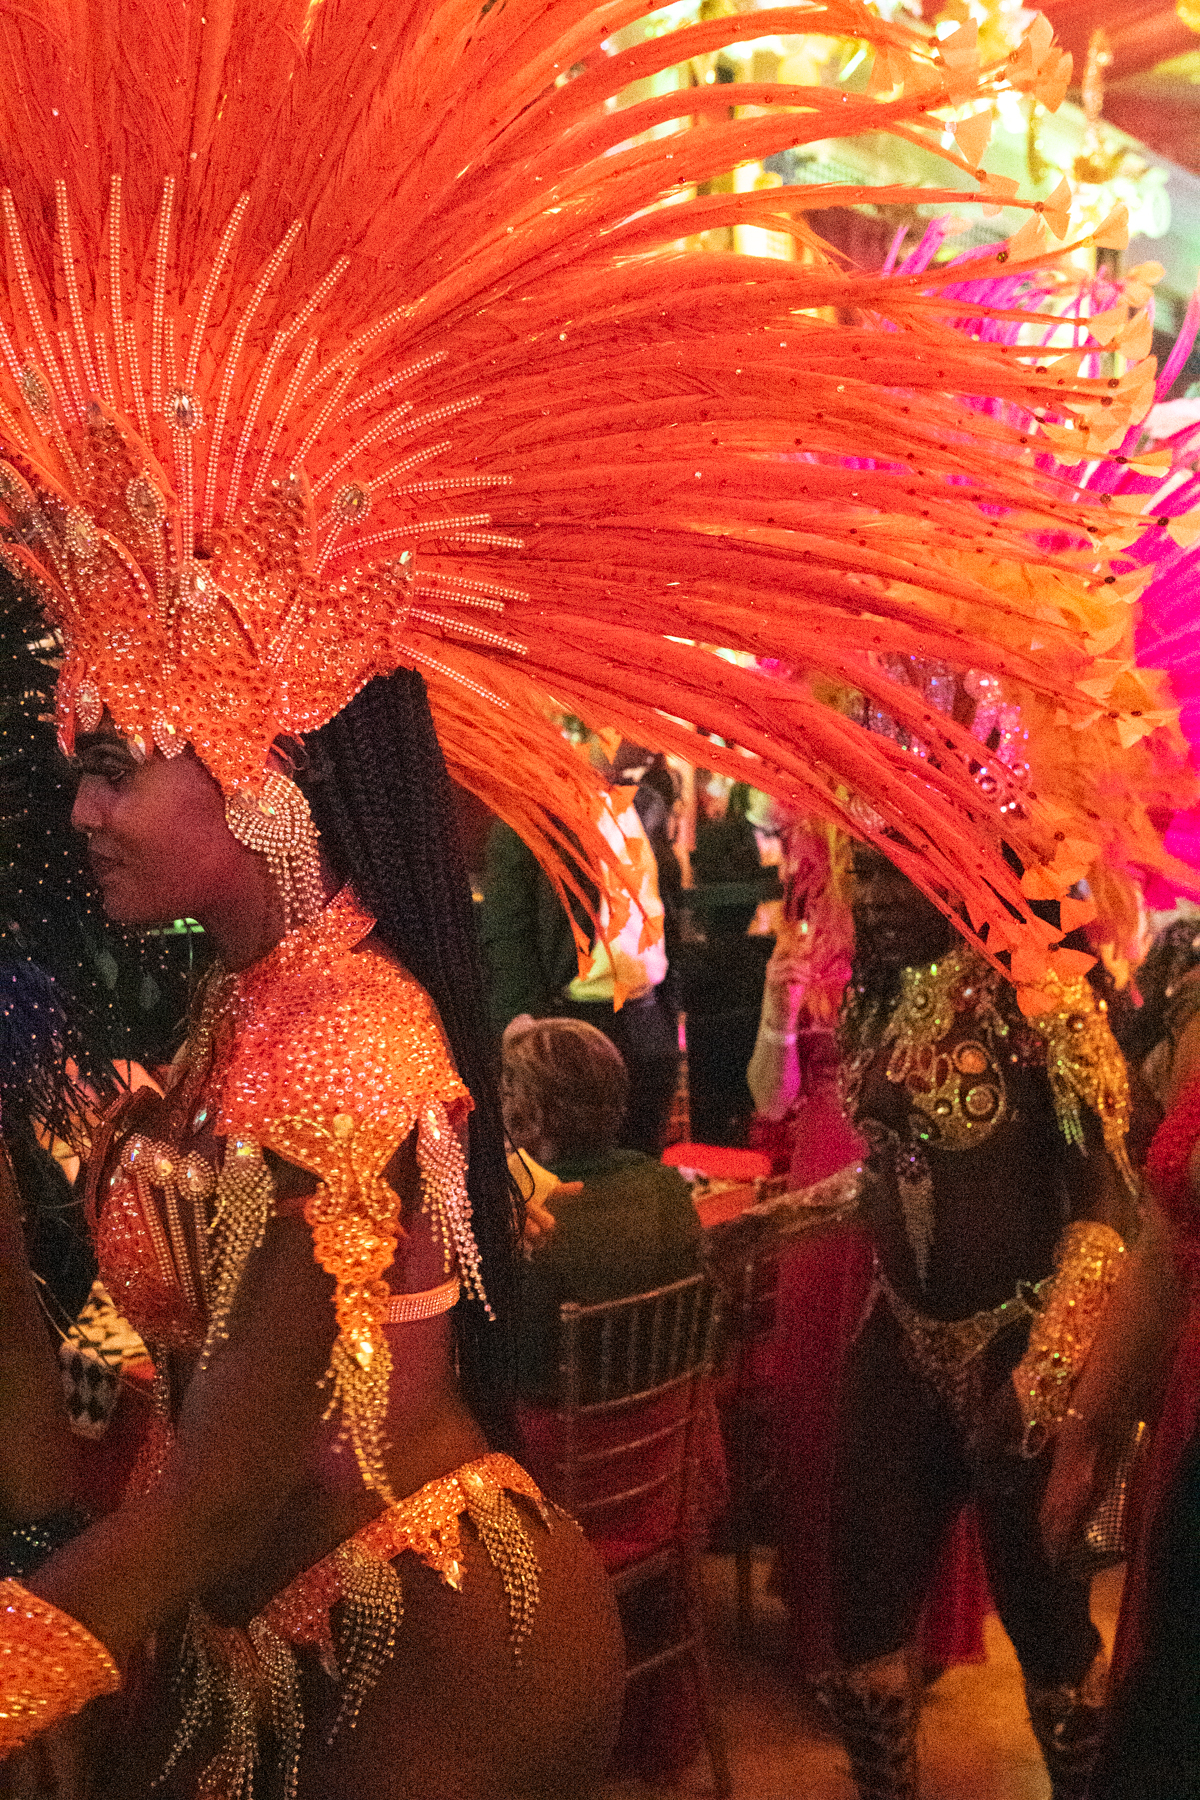 Stacie Flinner x Belmond Copacabana Carnival Ball-55.jpg